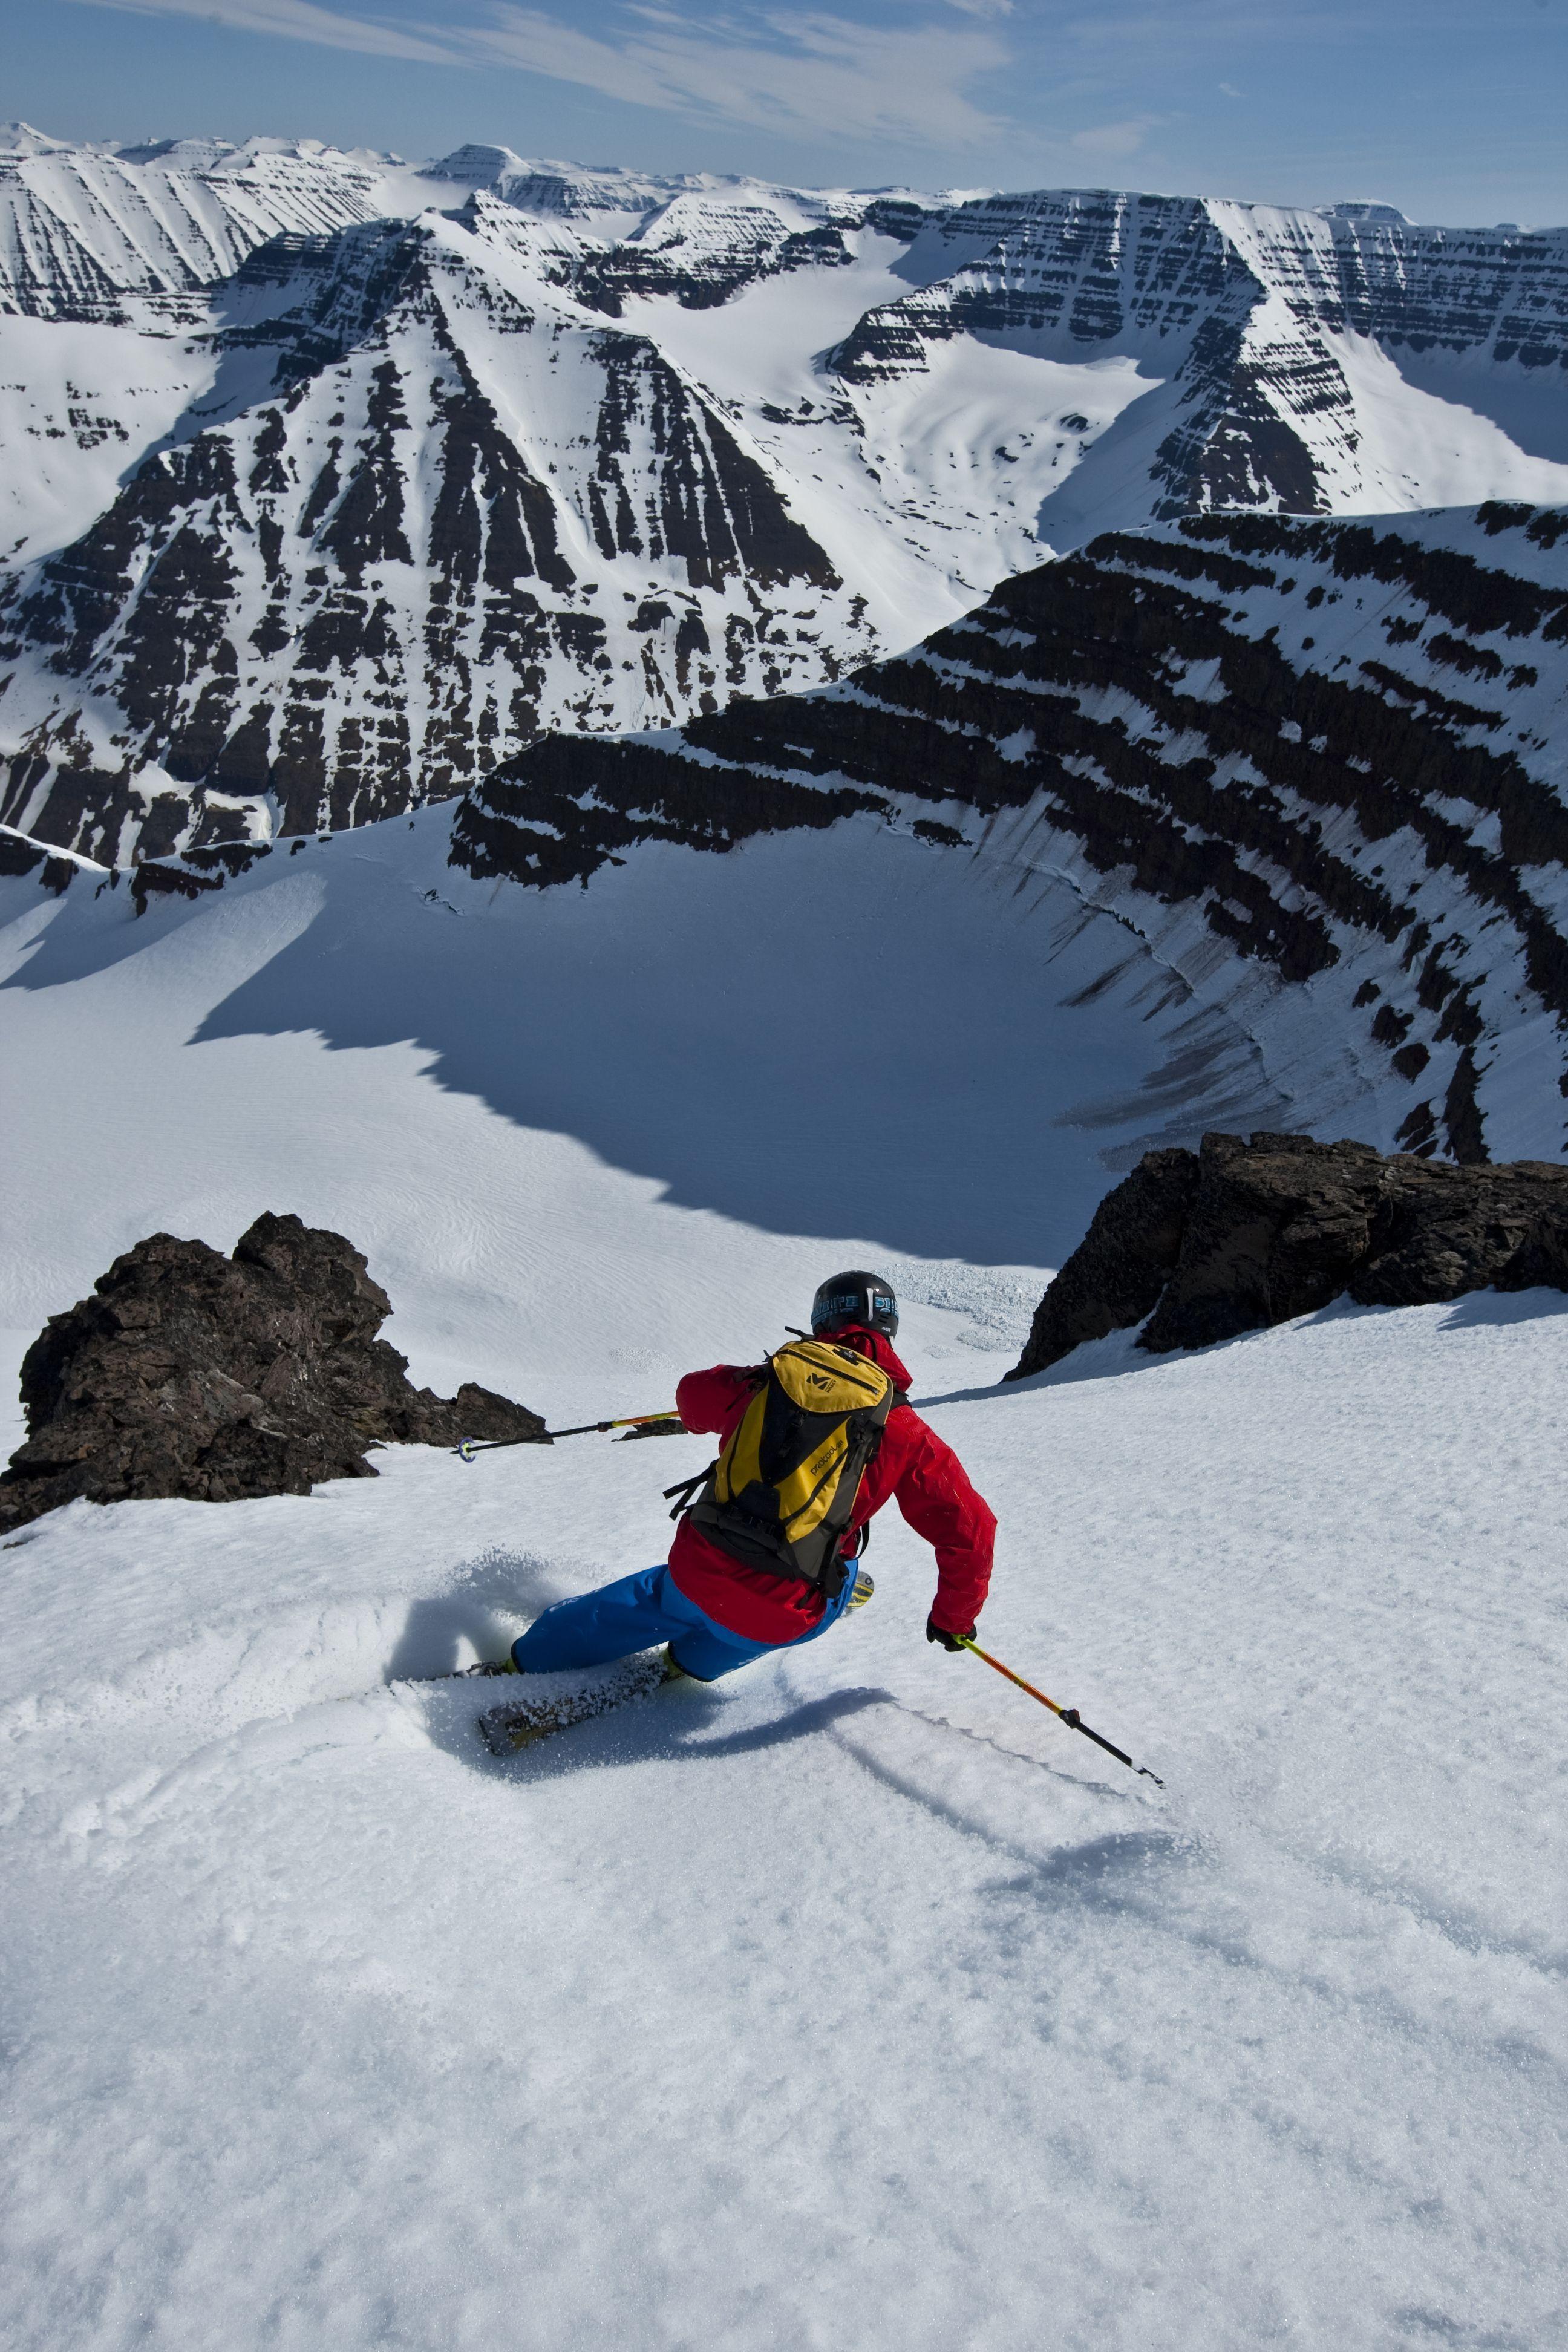 Heli Skiing In Iceland Alpine Skiing Skiing Snowboard